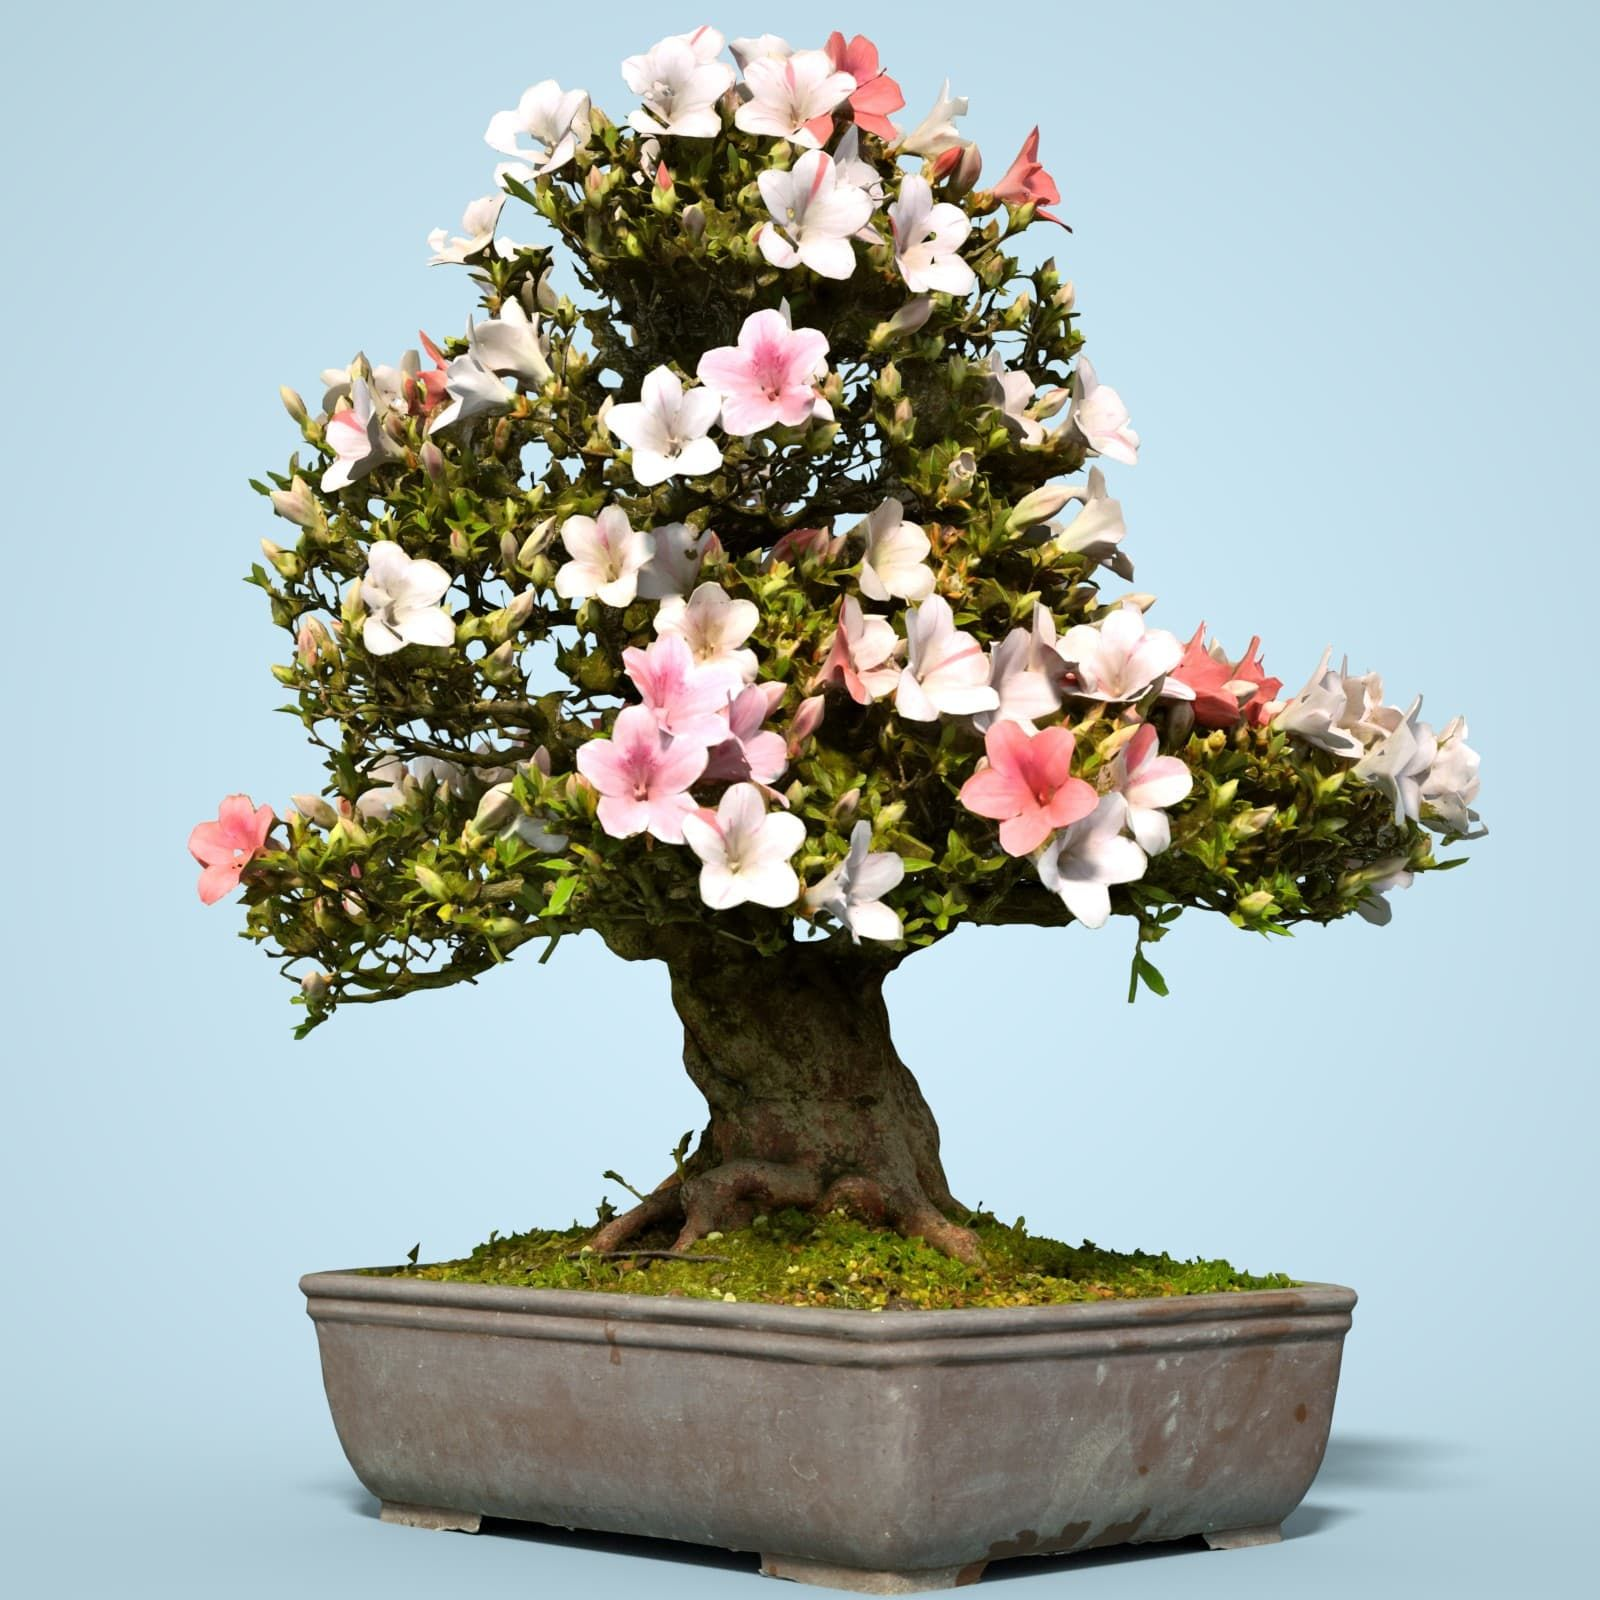 3d Satsuki Bonsai Tree Blossom Model Pinterest Bonsai